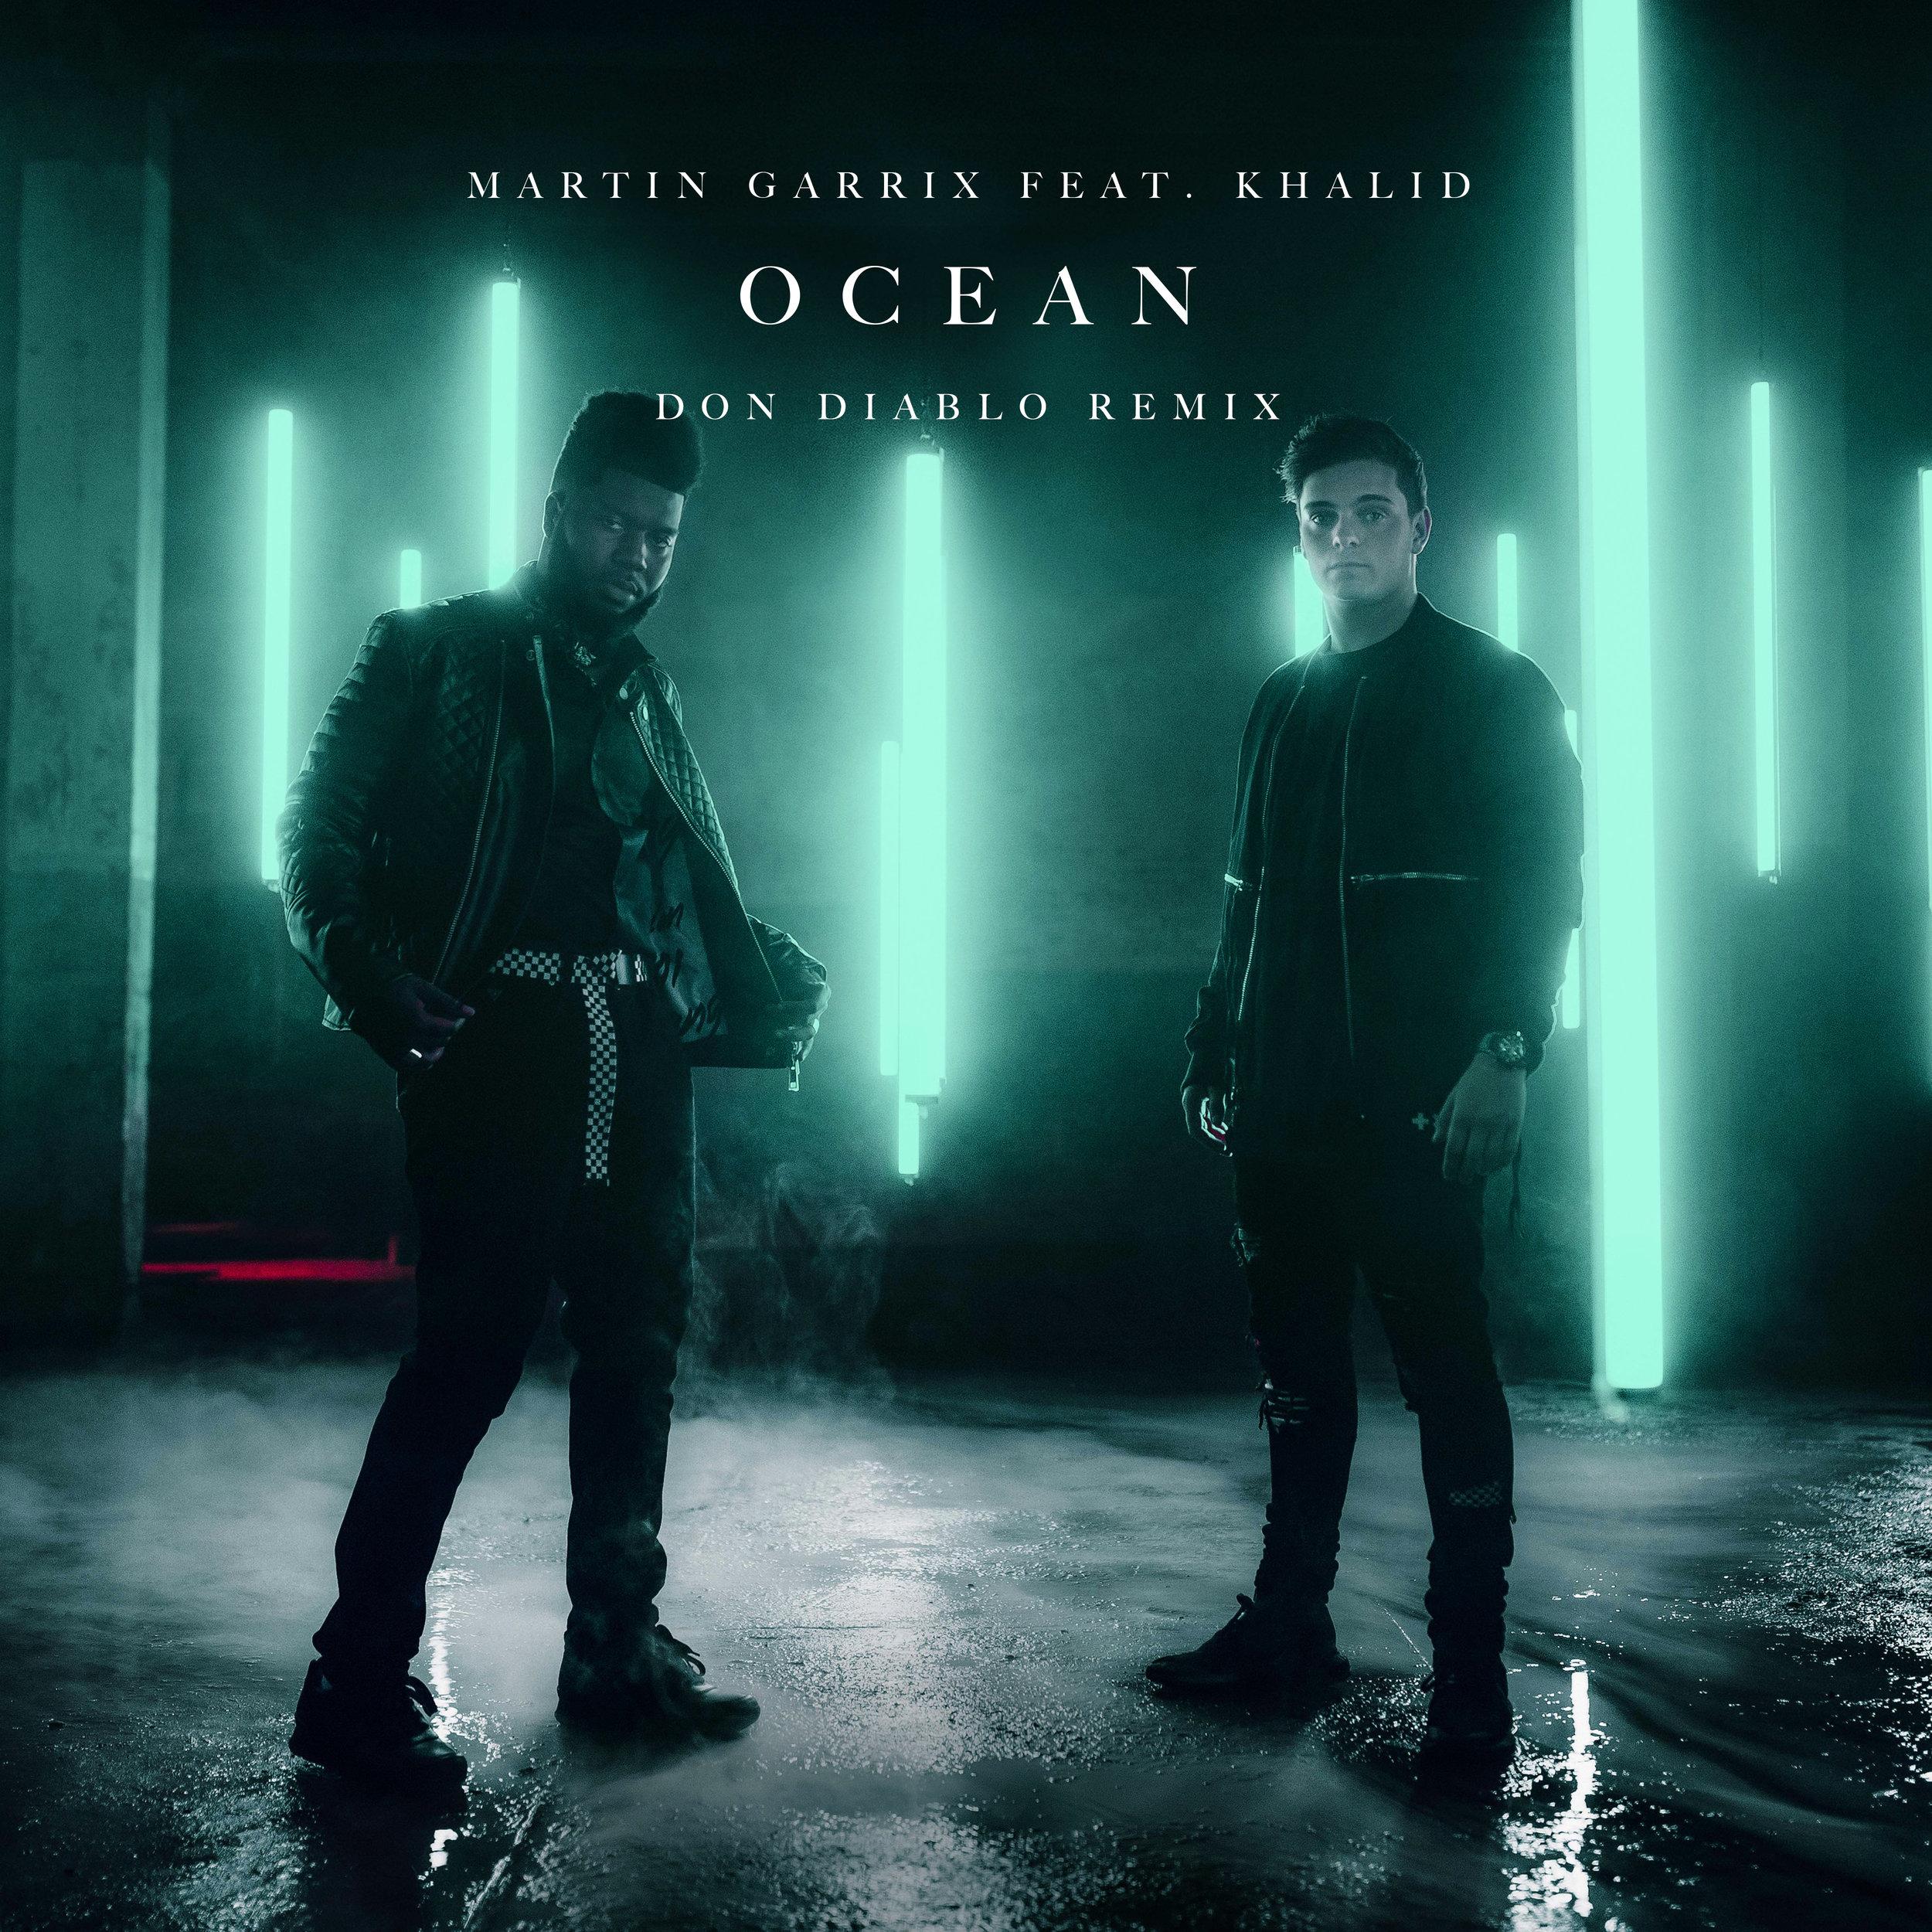 Ocean don diablo remix artwork*.jpg